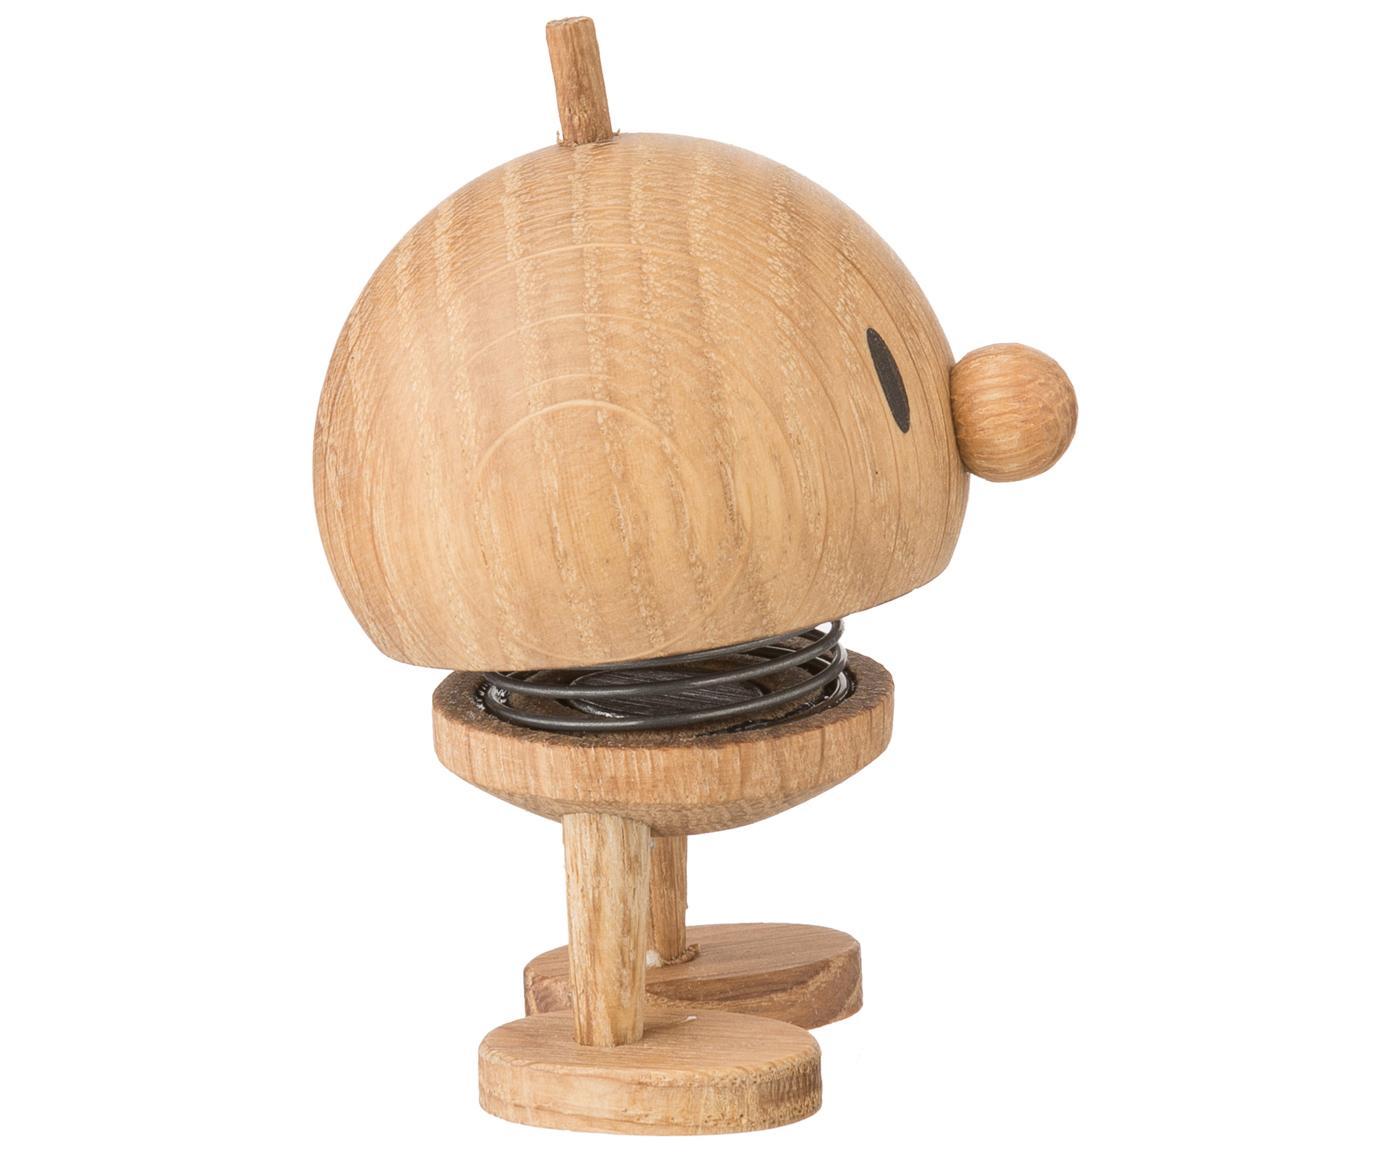 Decoratief object Baby Woody Bumble, Object: eikenhout, Bruin, Ø 5 x H 7 cm